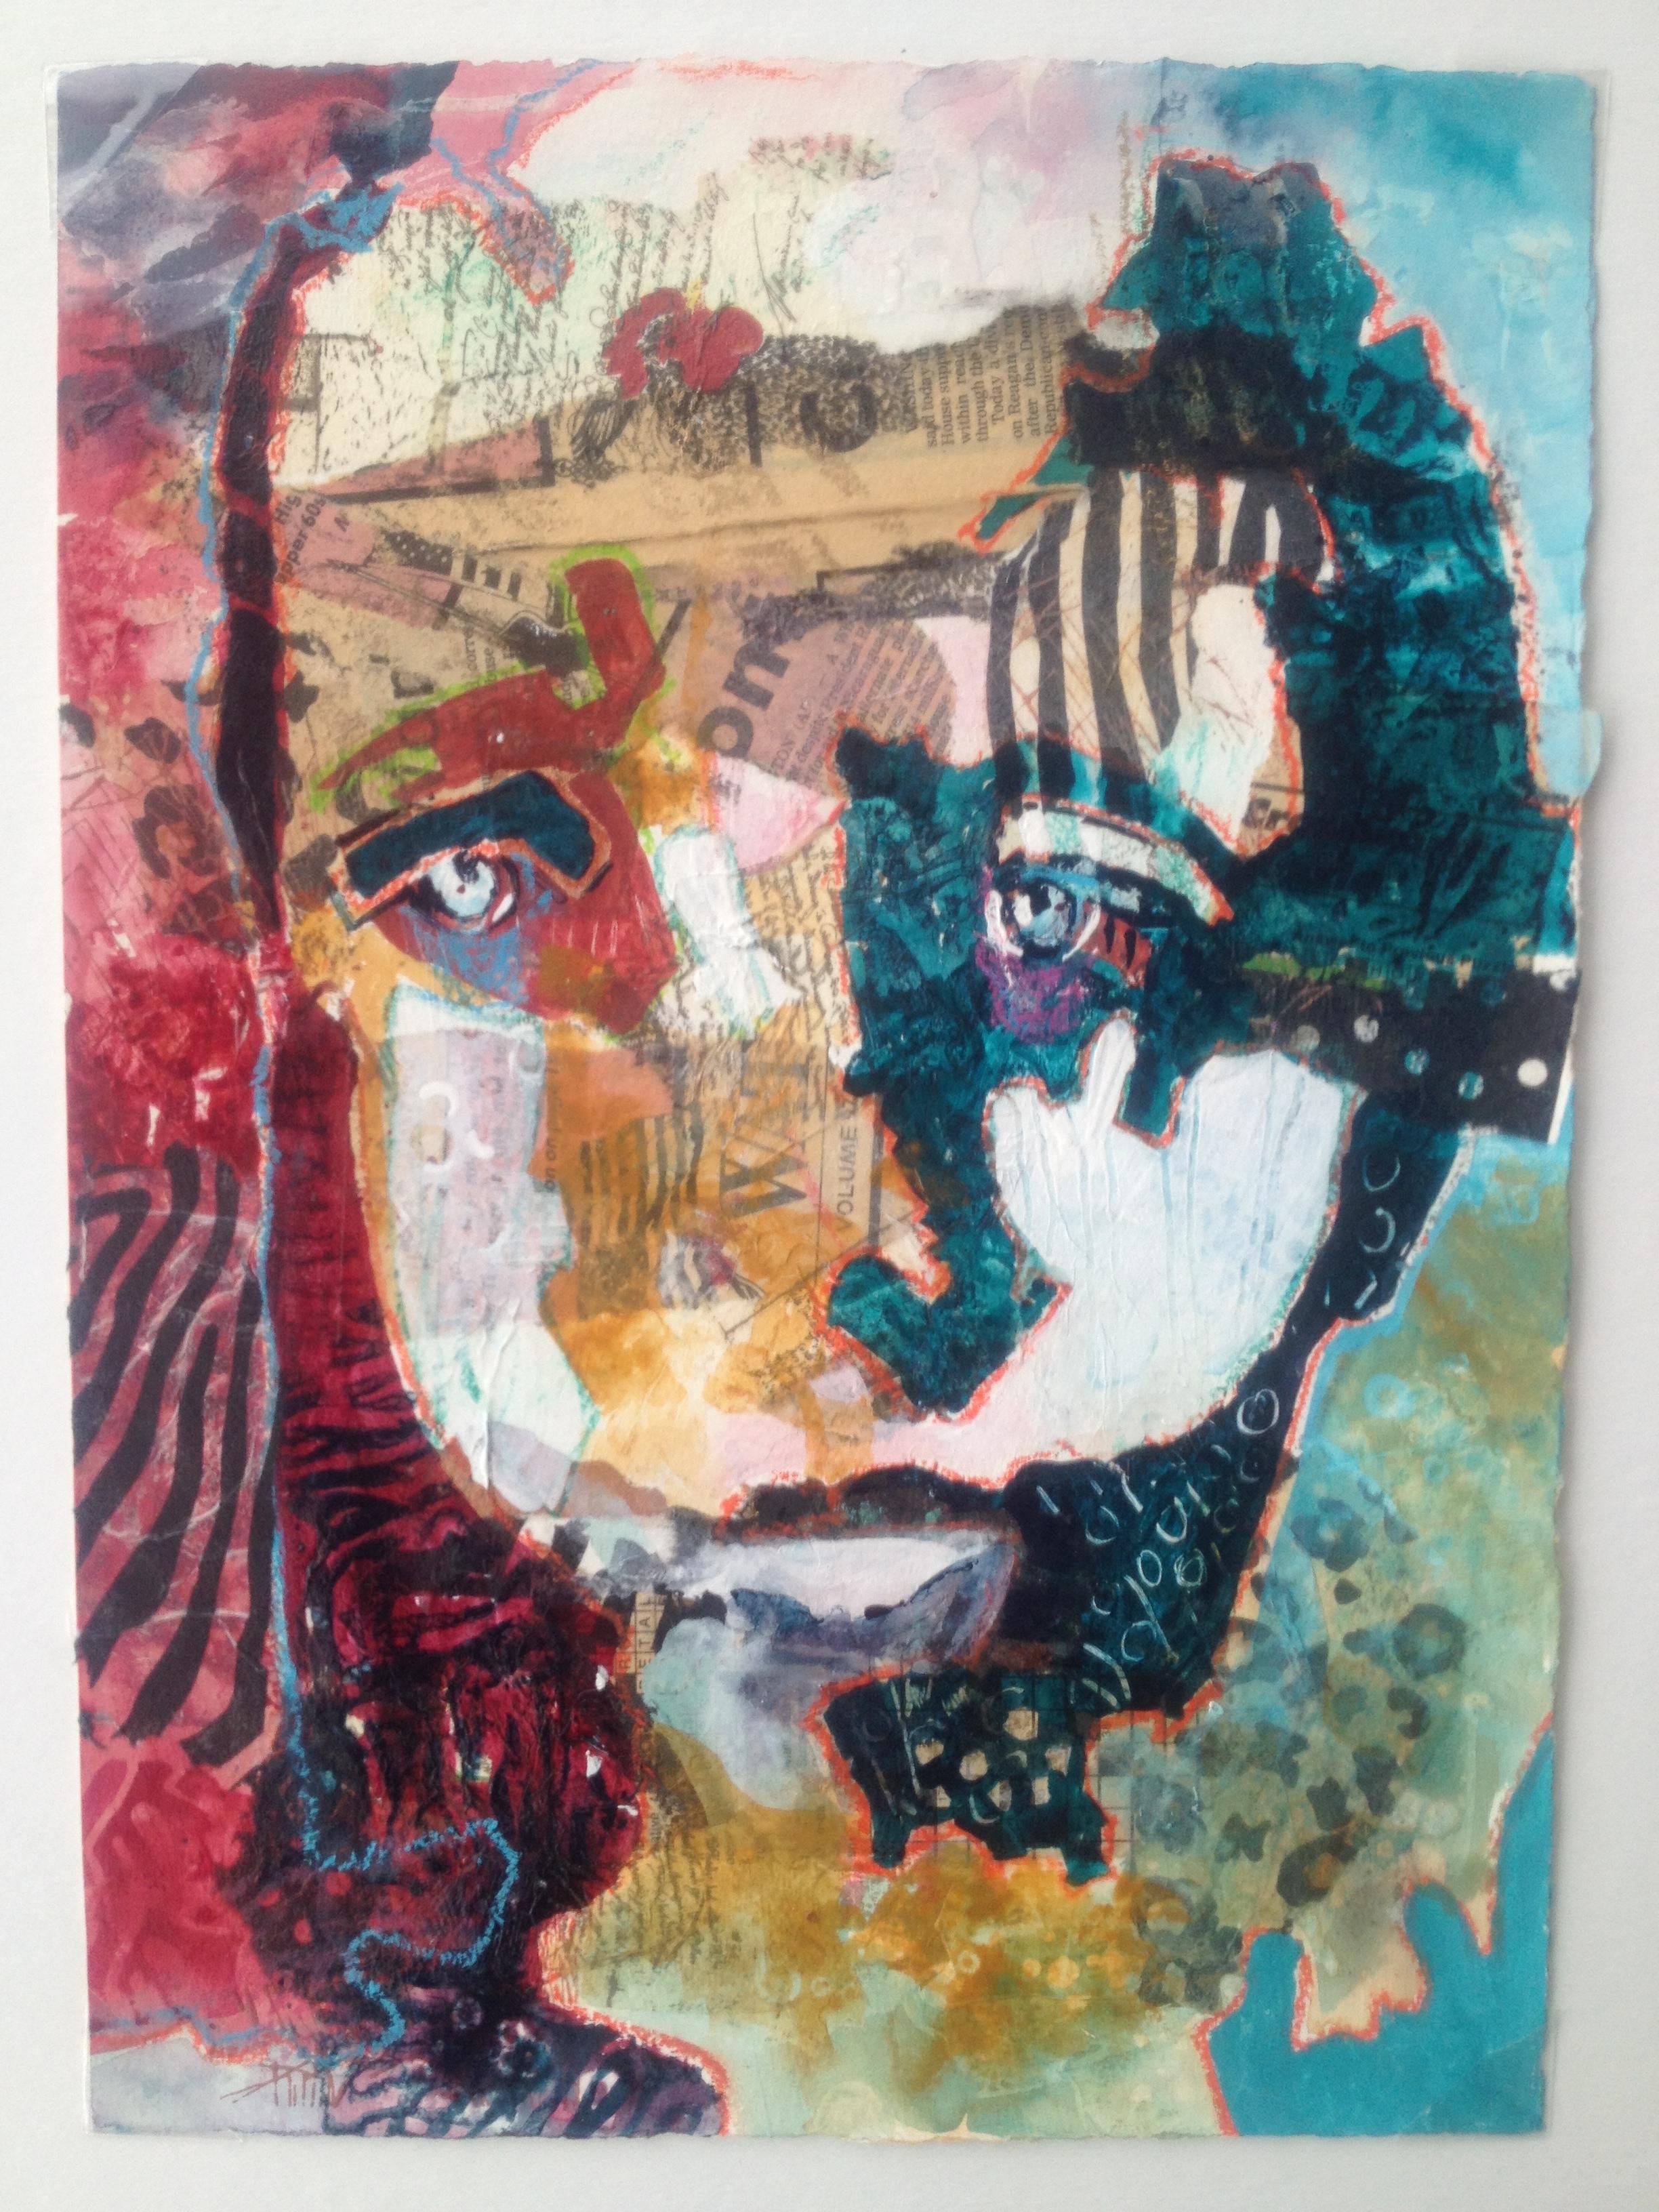 NFS by Jennifer Stone at Jennifer Stone Artwork